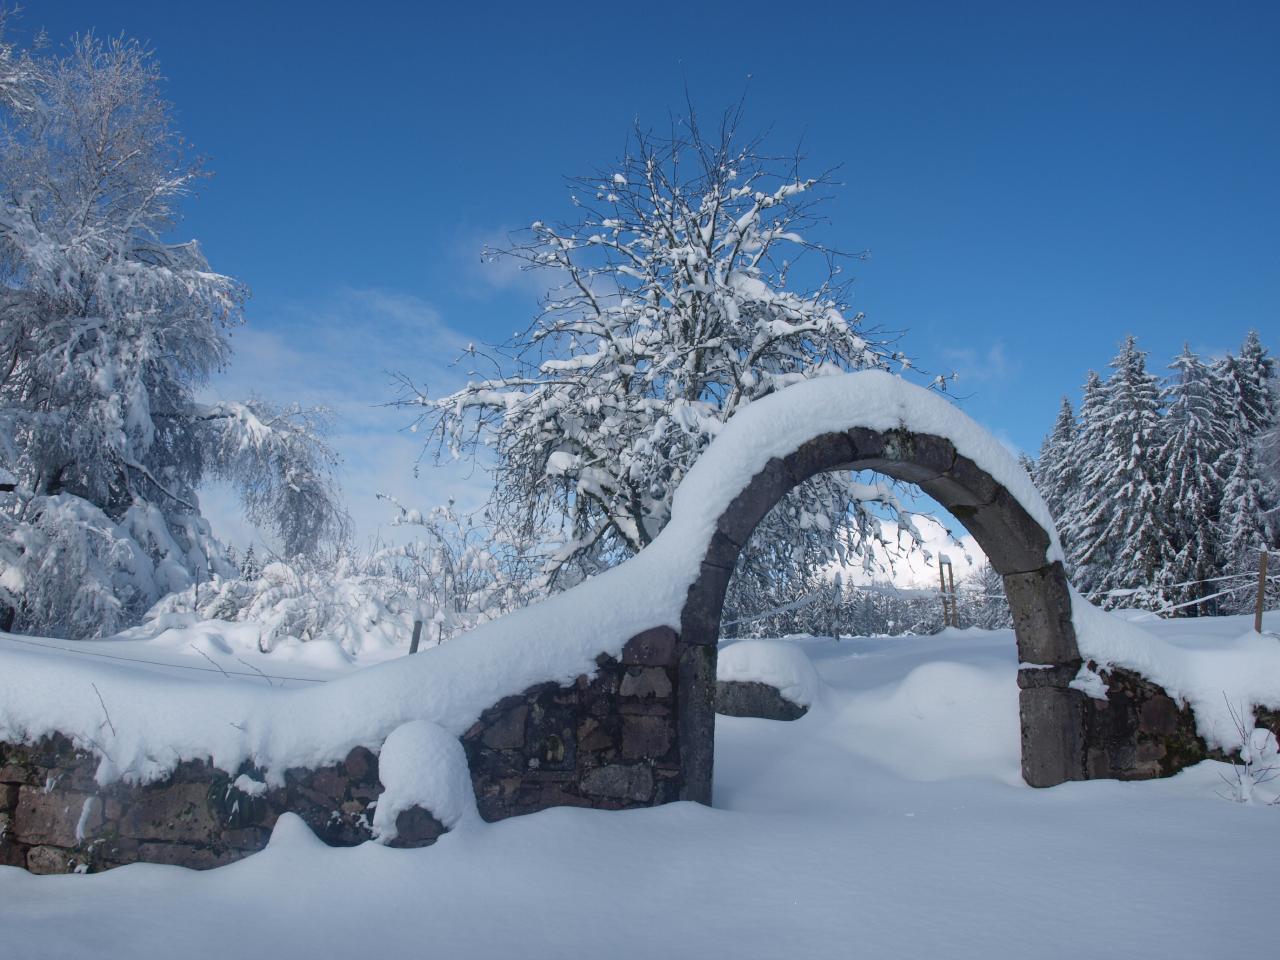 Ferienhaus Steinhäuschen Shila, im Naturparc der Vogesen,  mit Saunahaus (1717460), La Rosière, Haute-Saône, Franche-Comté, Frankreich, Bild 27